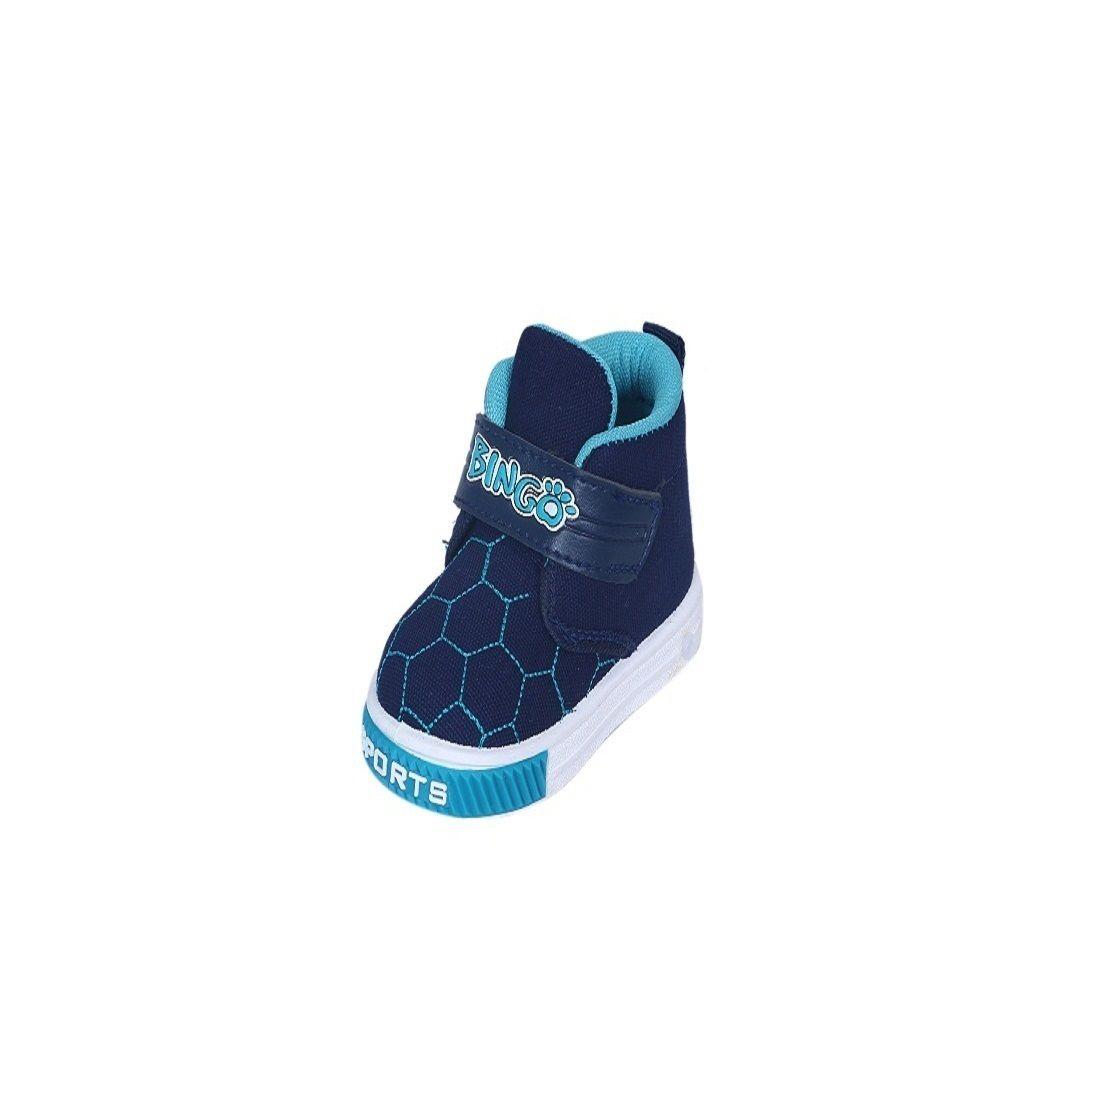 buy cheap footaction Kats Infants Casual Shoe cheap sale prices buy cheap best seller GqEW9kgkFH